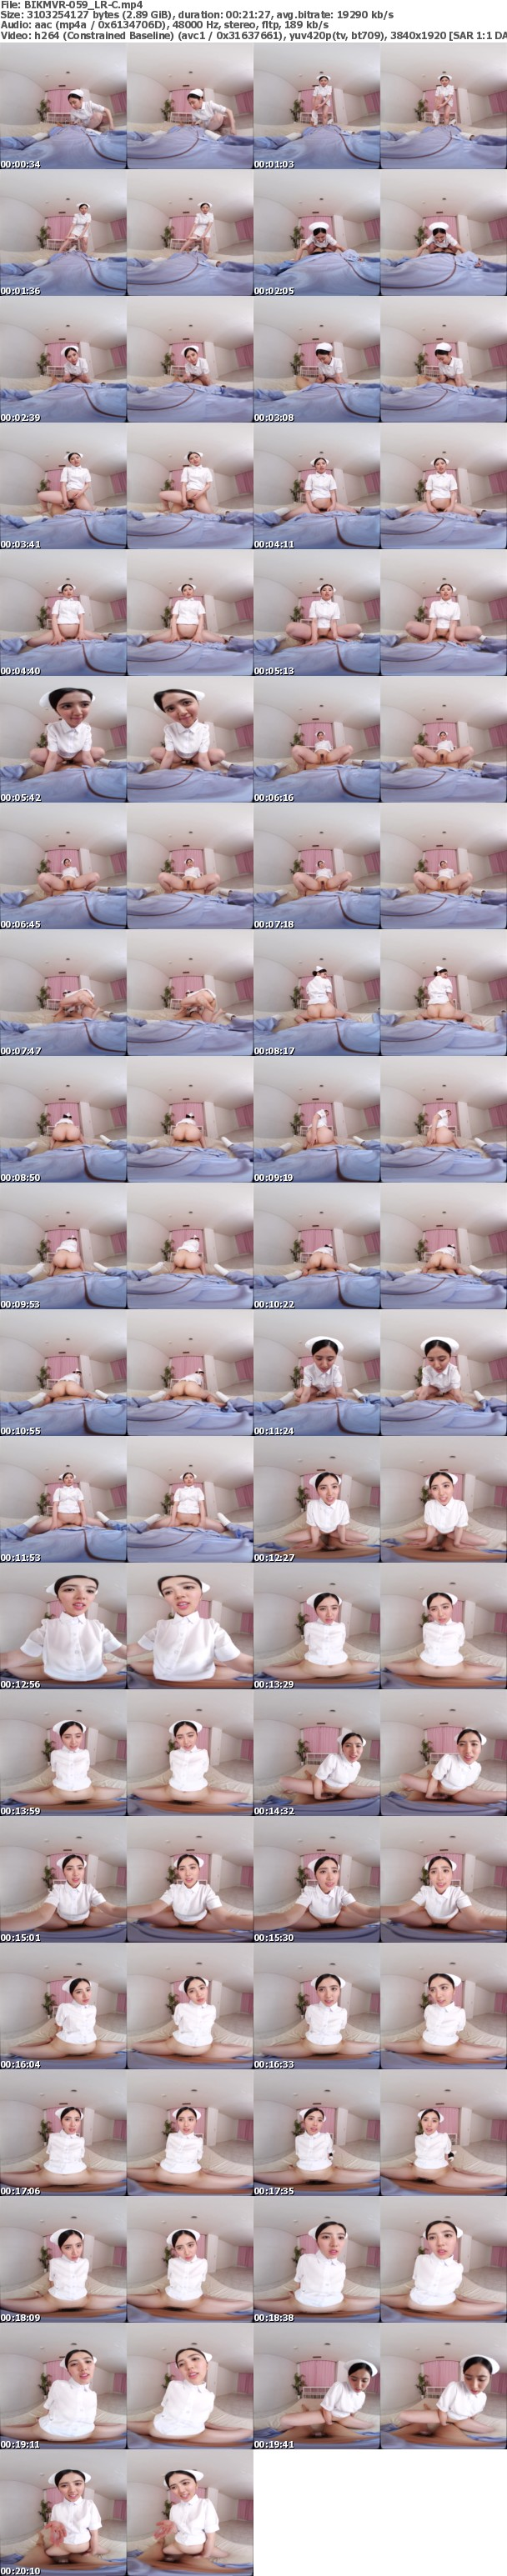 (VR) BIKMVR-059 【4K匠】献身的医療看護VR 手コキ 口内射精処理 生性交補助付き 担当看護士 川崎亜里沙さん